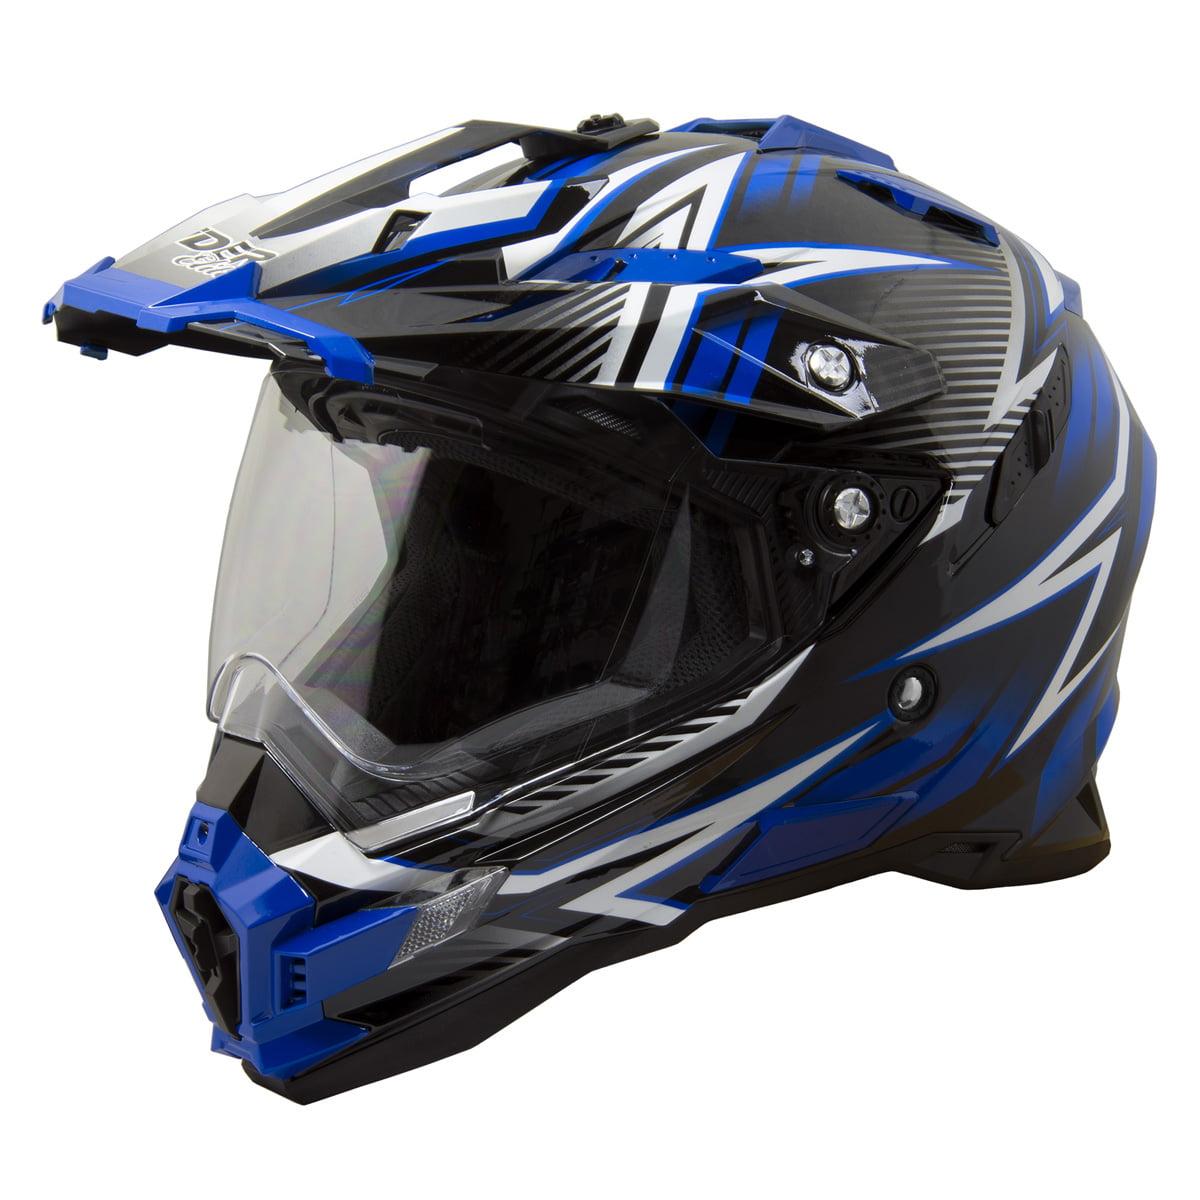 Raider Elite Eclipse Dual Sport Helmet MX ATV Dirt Bike Off Road Motorcycle DOT